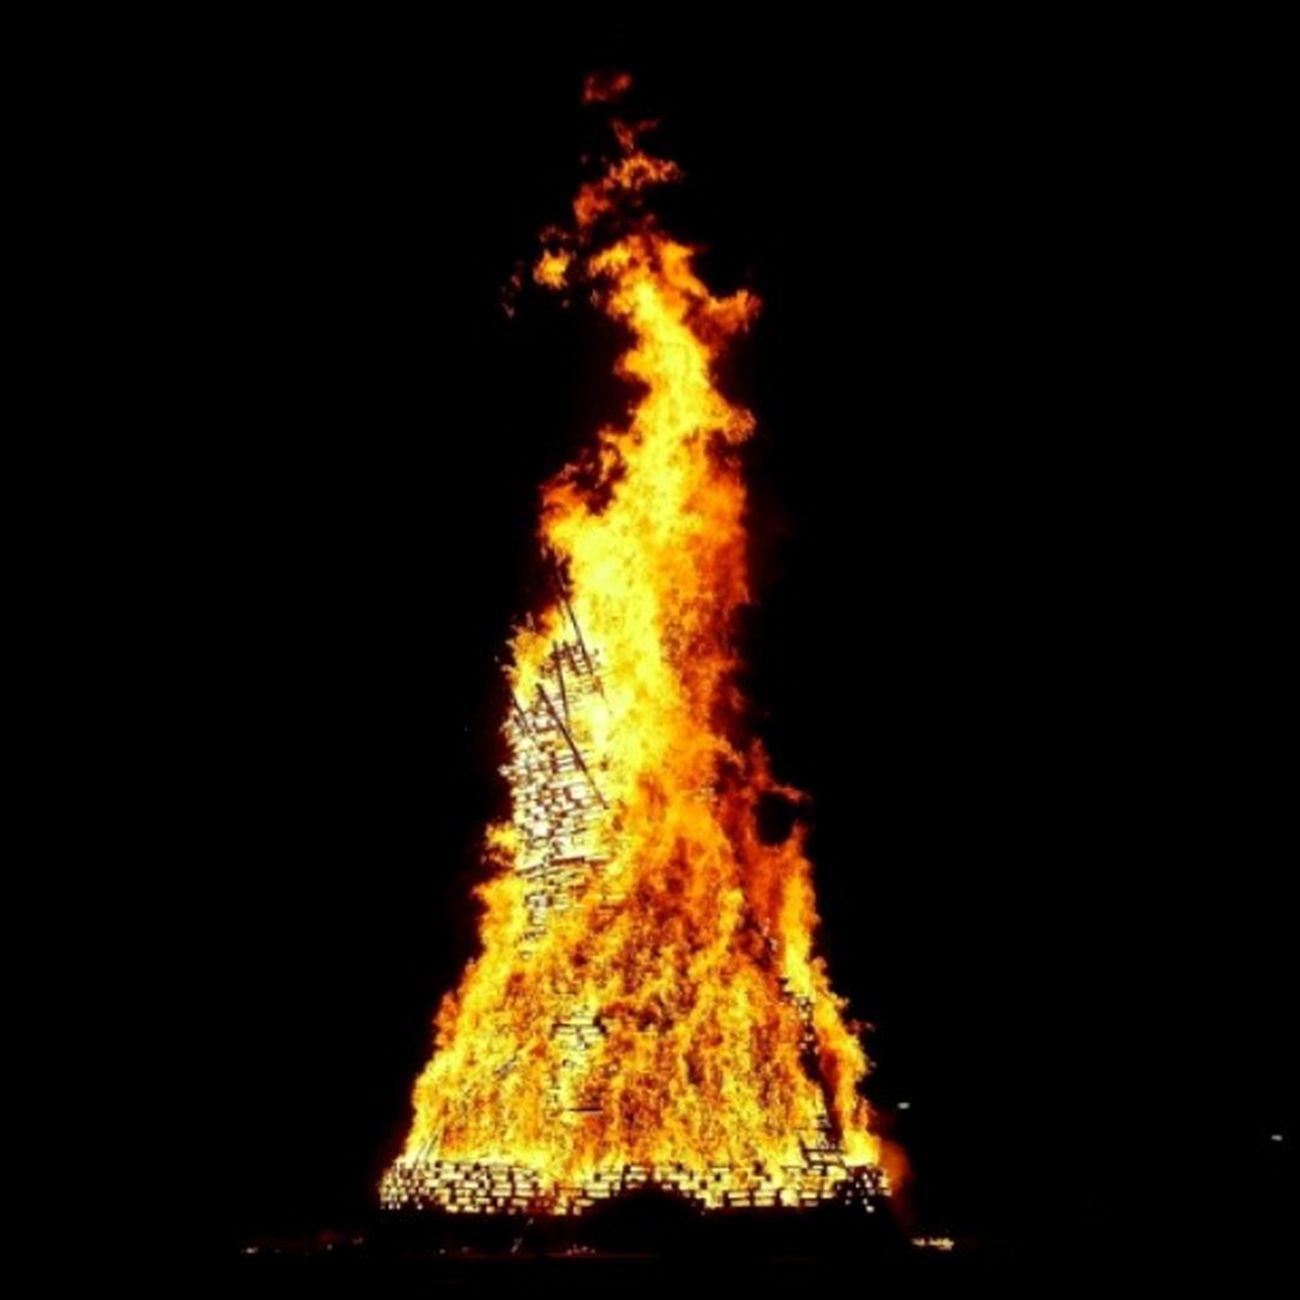 Bonfire Dramaporn Fireporn Nature Fire Tradition Beautiful Flame Trouble Ni_insta Northernireland Ireland Landscape Photography Picoftheday Reflective Bonfire